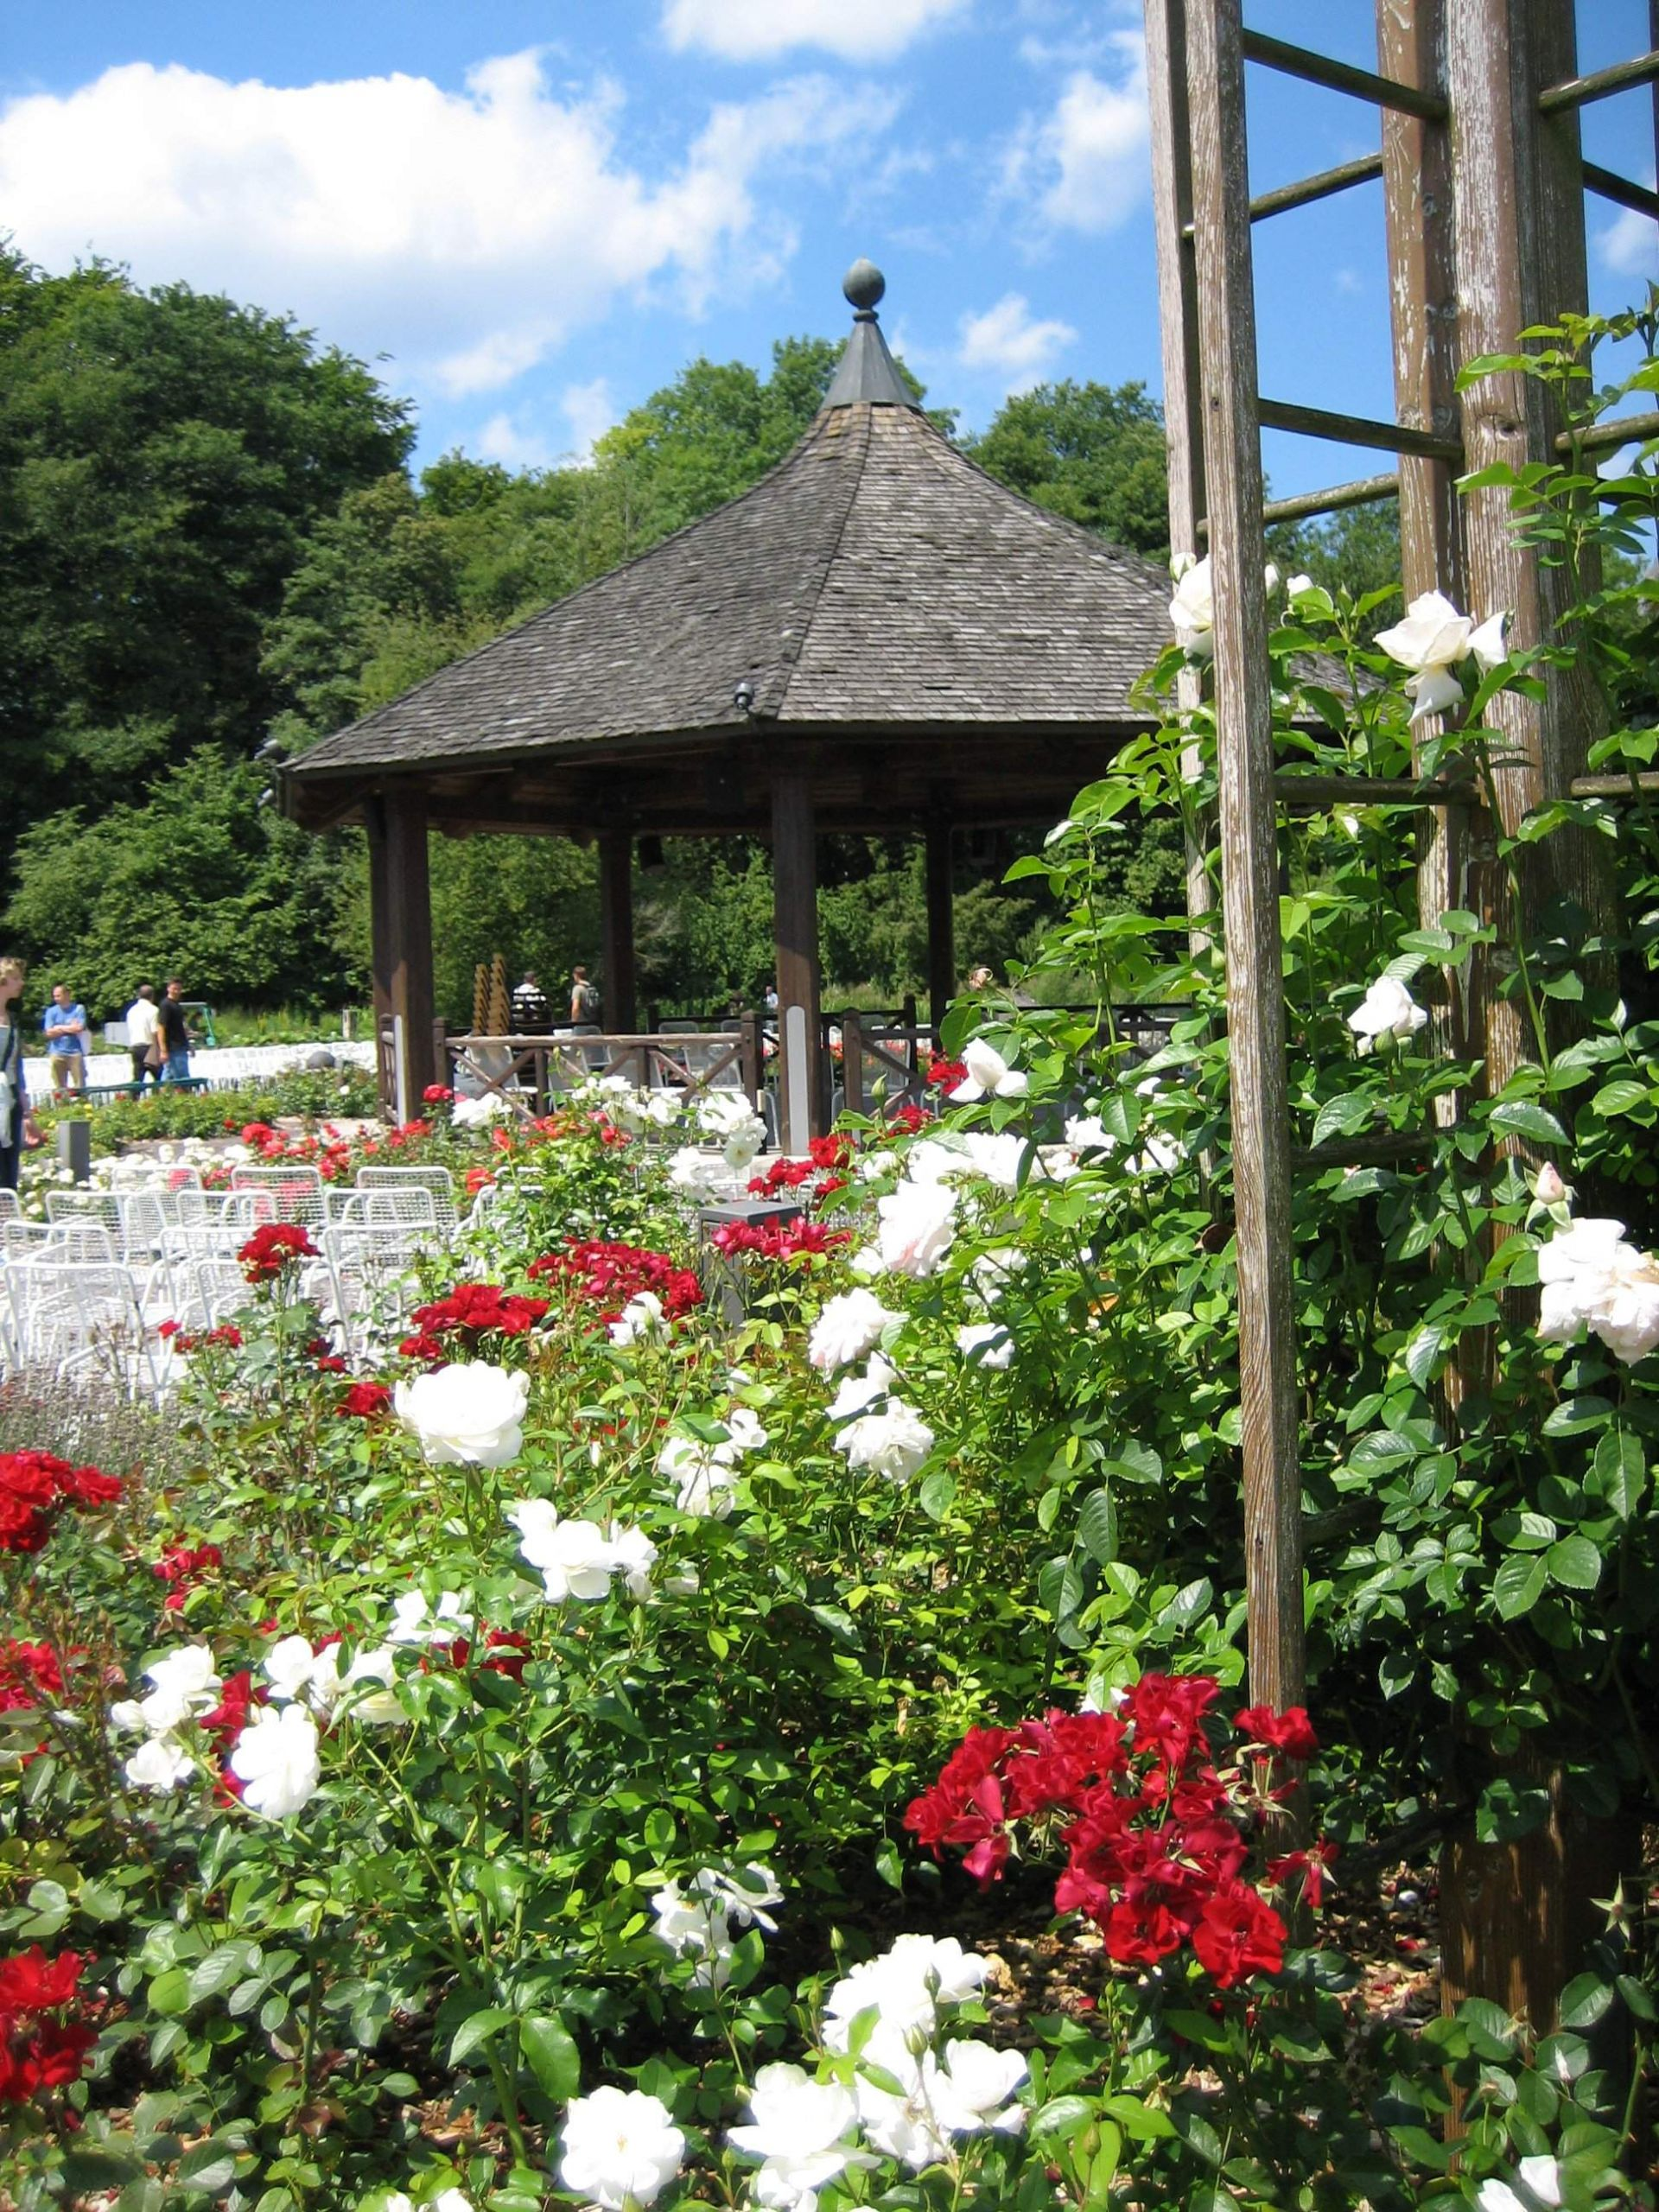 Garten Augsburg Einzigartig Datei Augsburg Bot Garten Am Rosenpavillon –